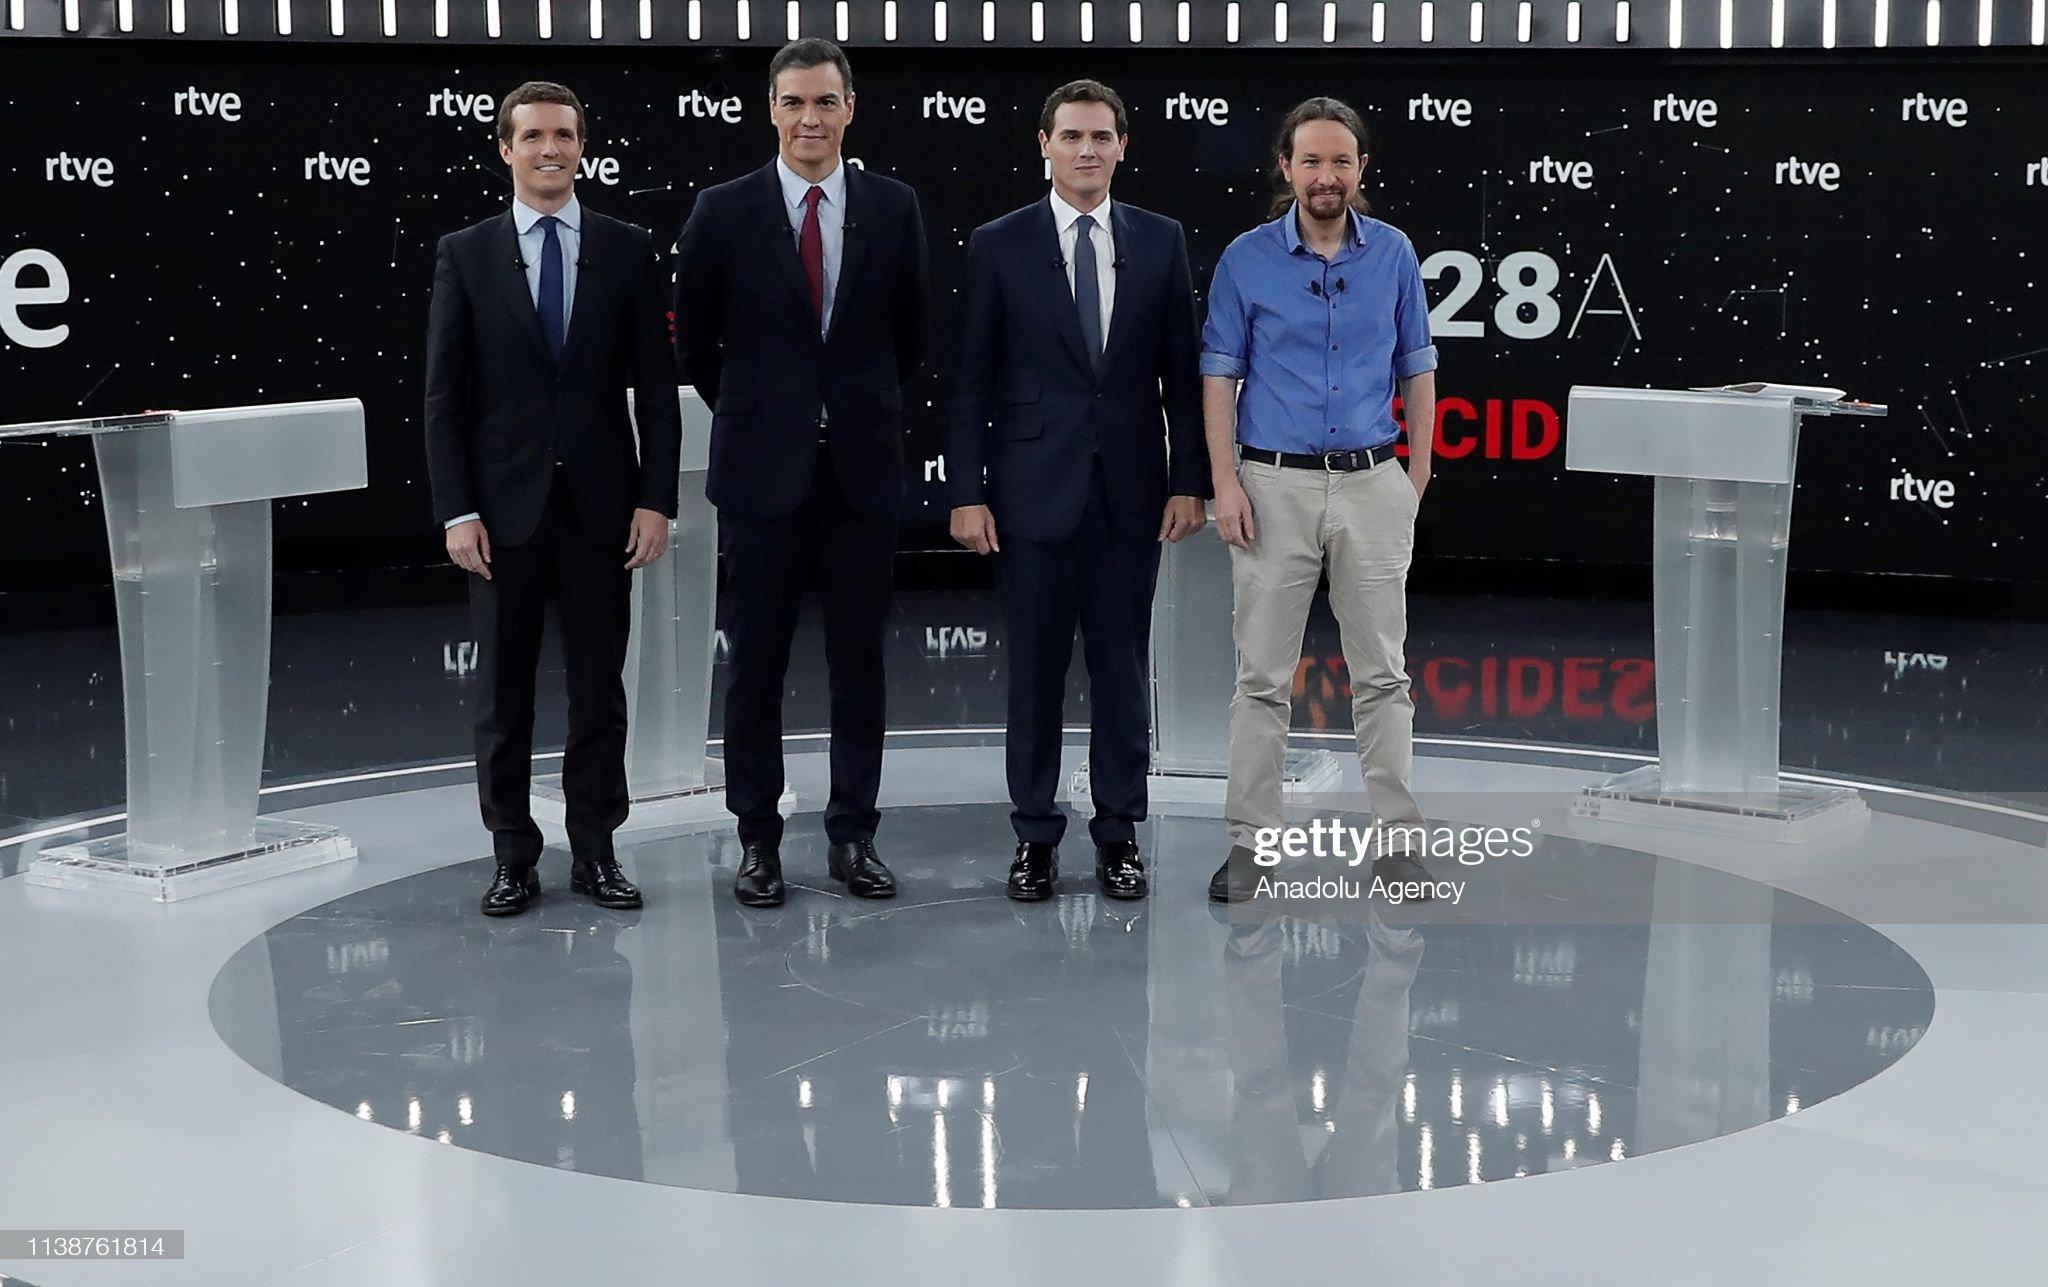 ¿Cuánto mide Pablo Casado?  - Estatura real: 1,77 - Página 7 Prime-minister-candidates-leader-of-podemos-party-pablo-iglesias-of-picture-id1138761814?s=2048x2048